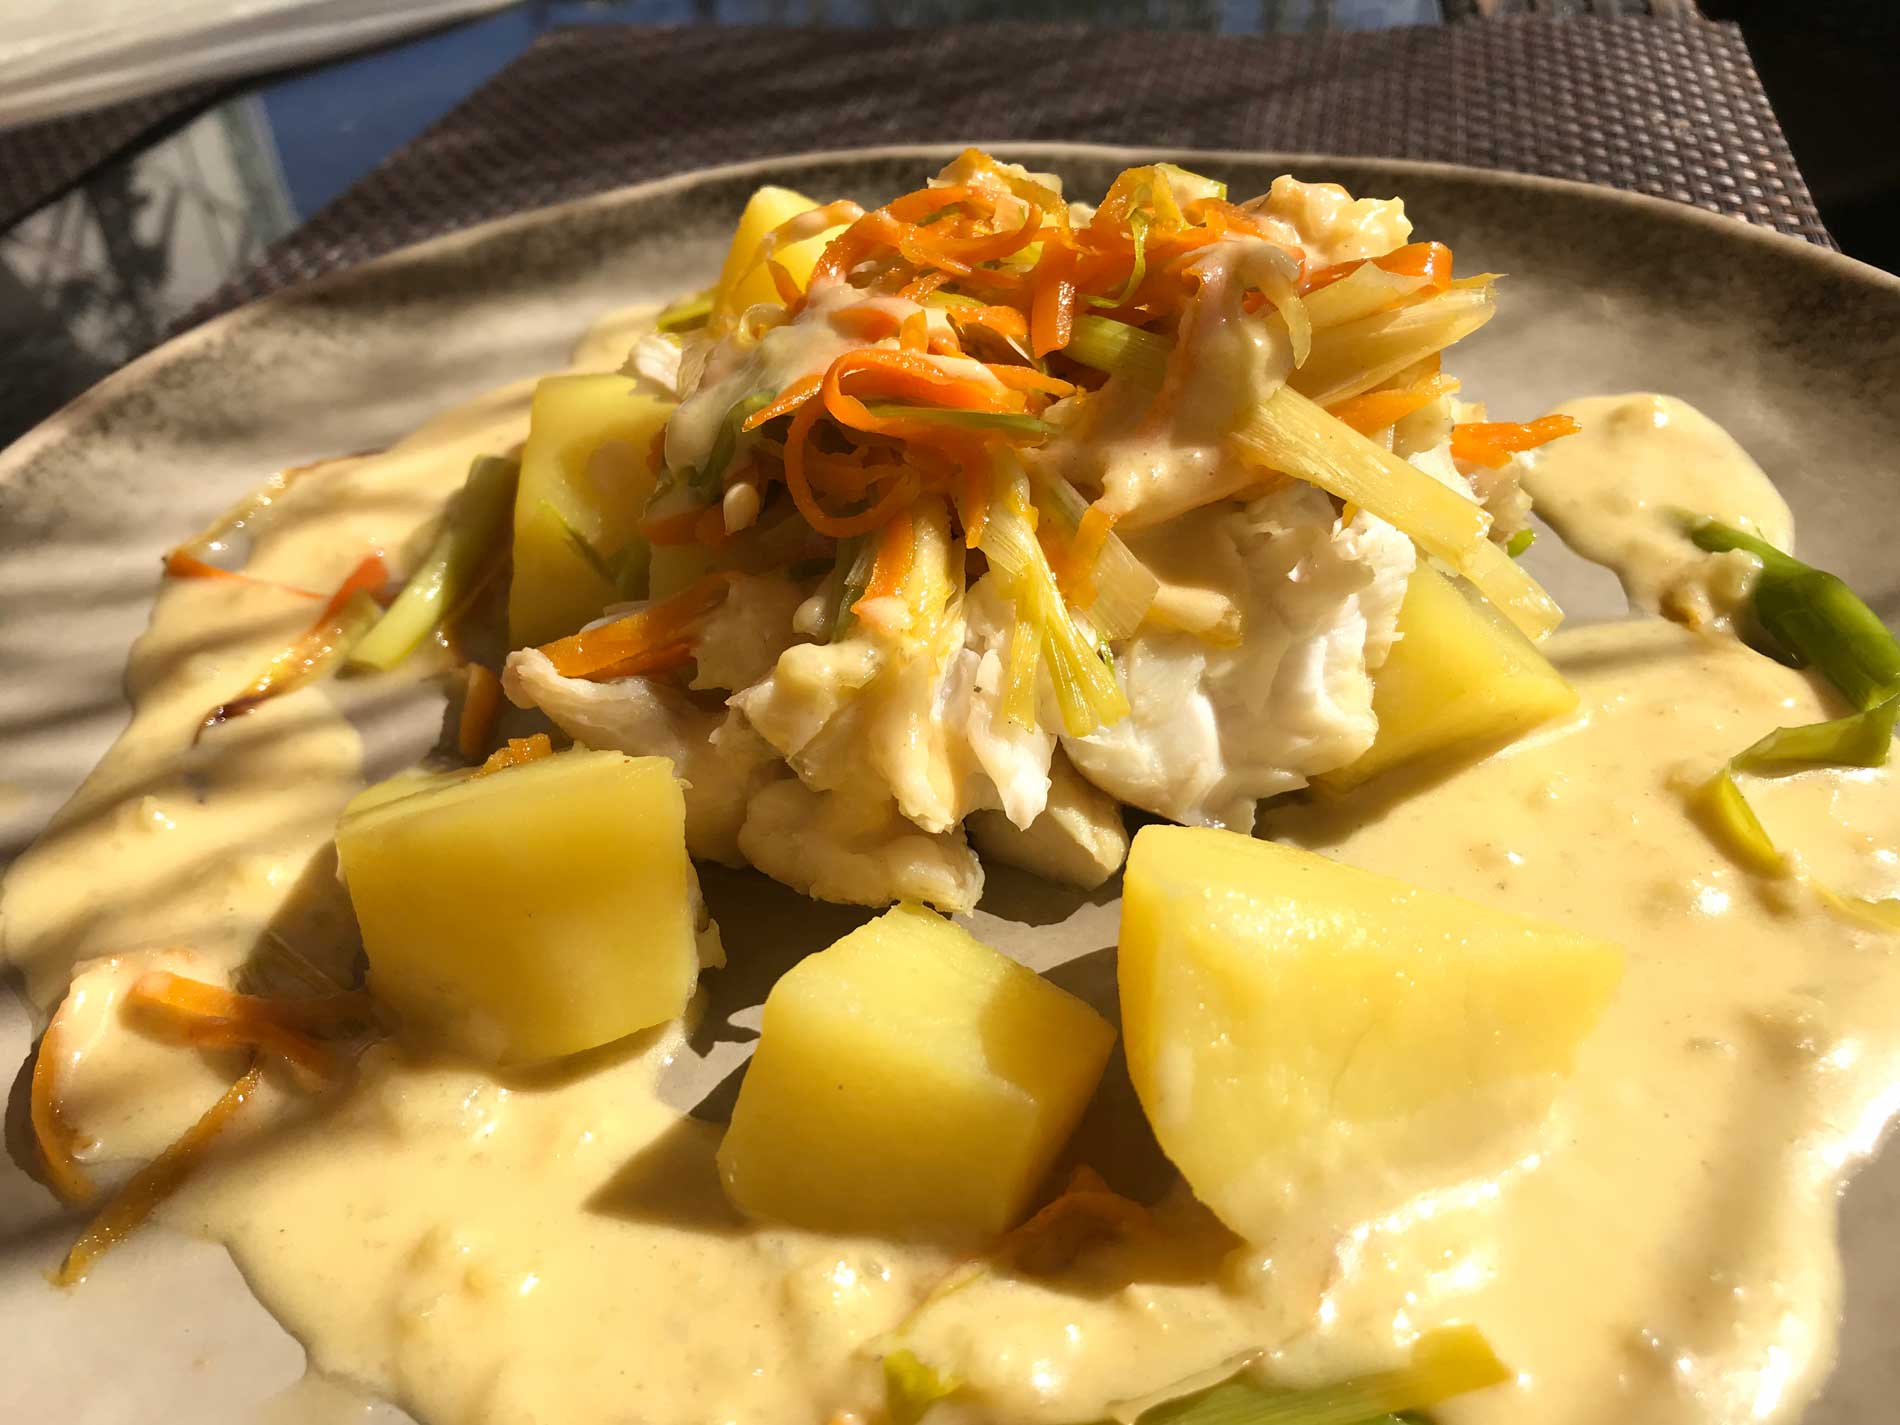 la meilleure recette de bourride safranée - lameilleurecette